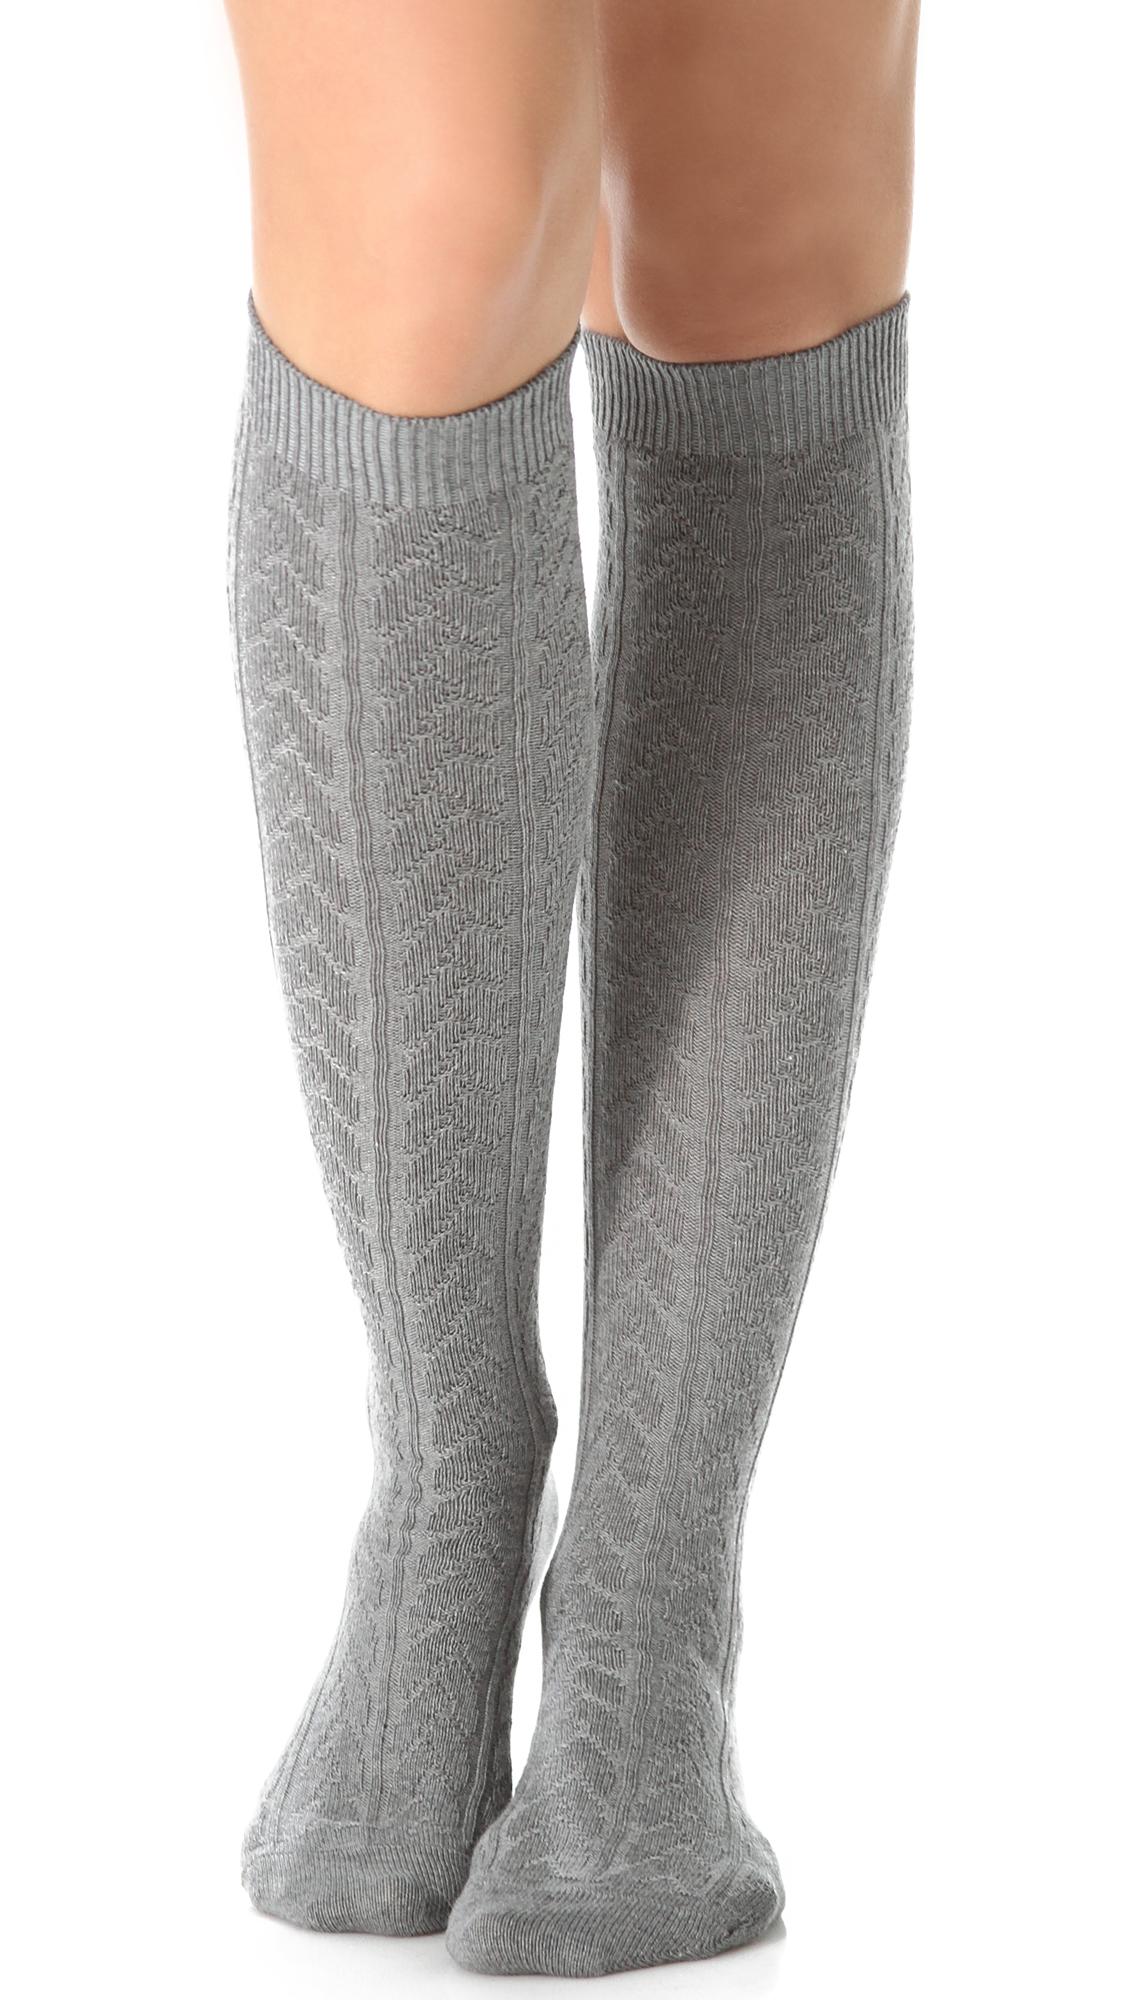 b814be0ff Falke Striggings Cable Knit Knee High Socks - Grey in Gray - Lyst